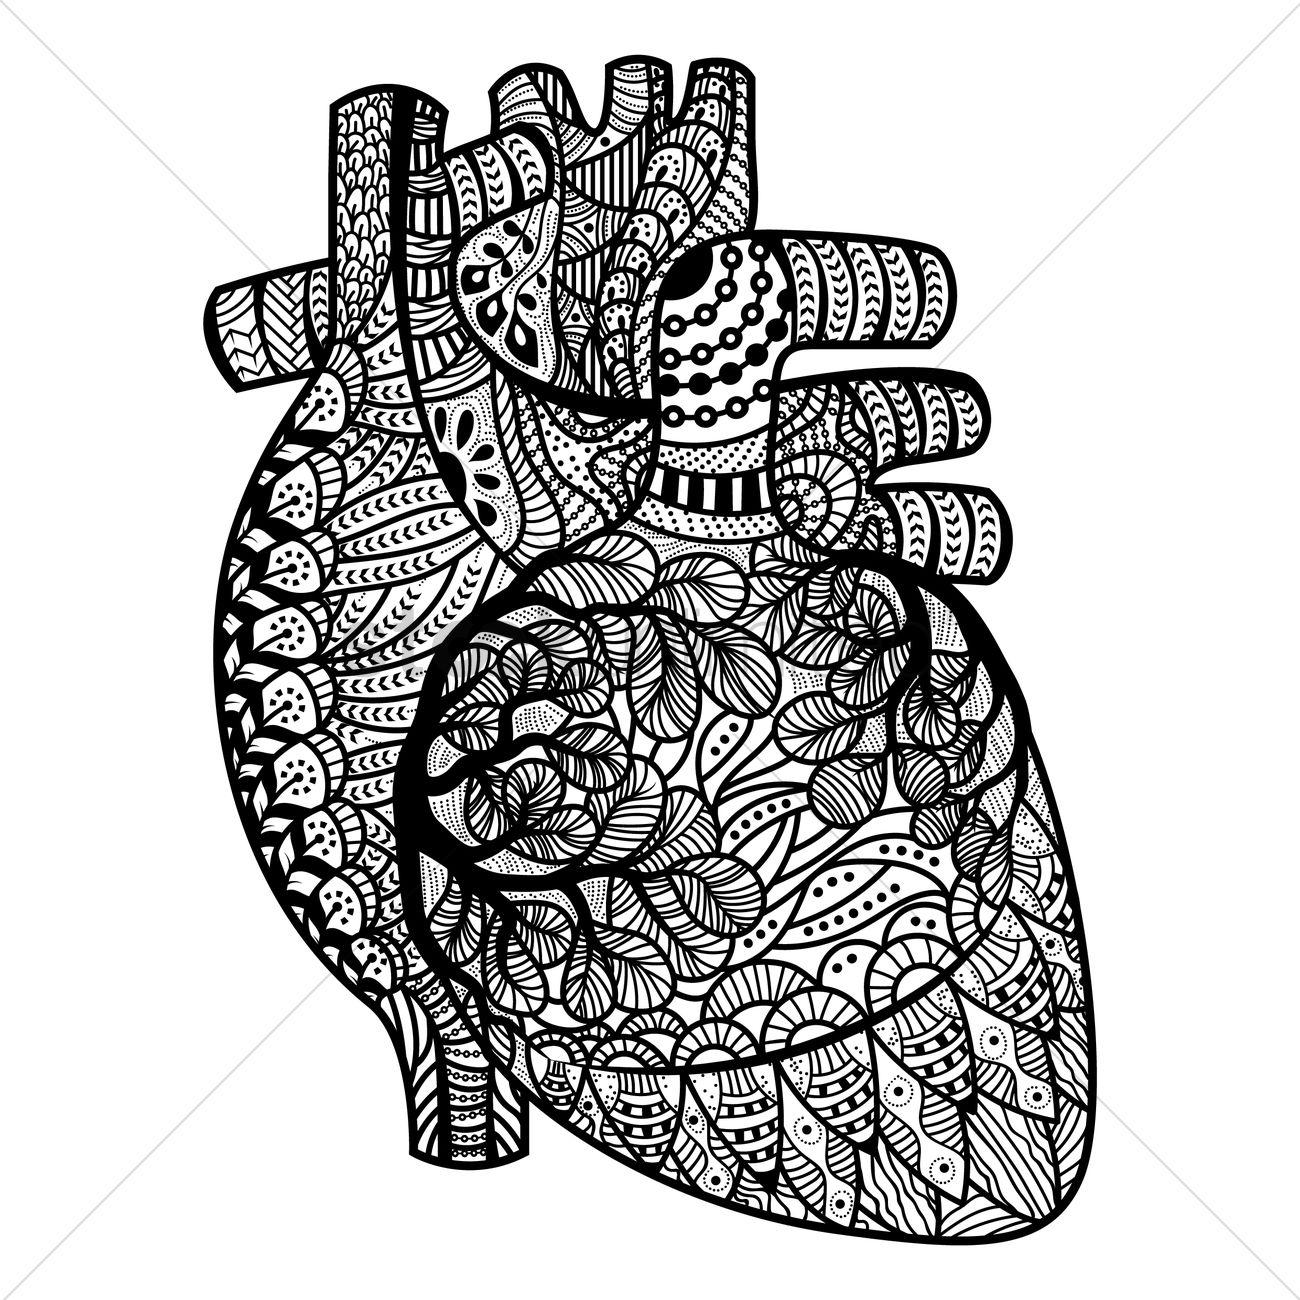 1300x1300 Intricate Human Heart Design Vector Image